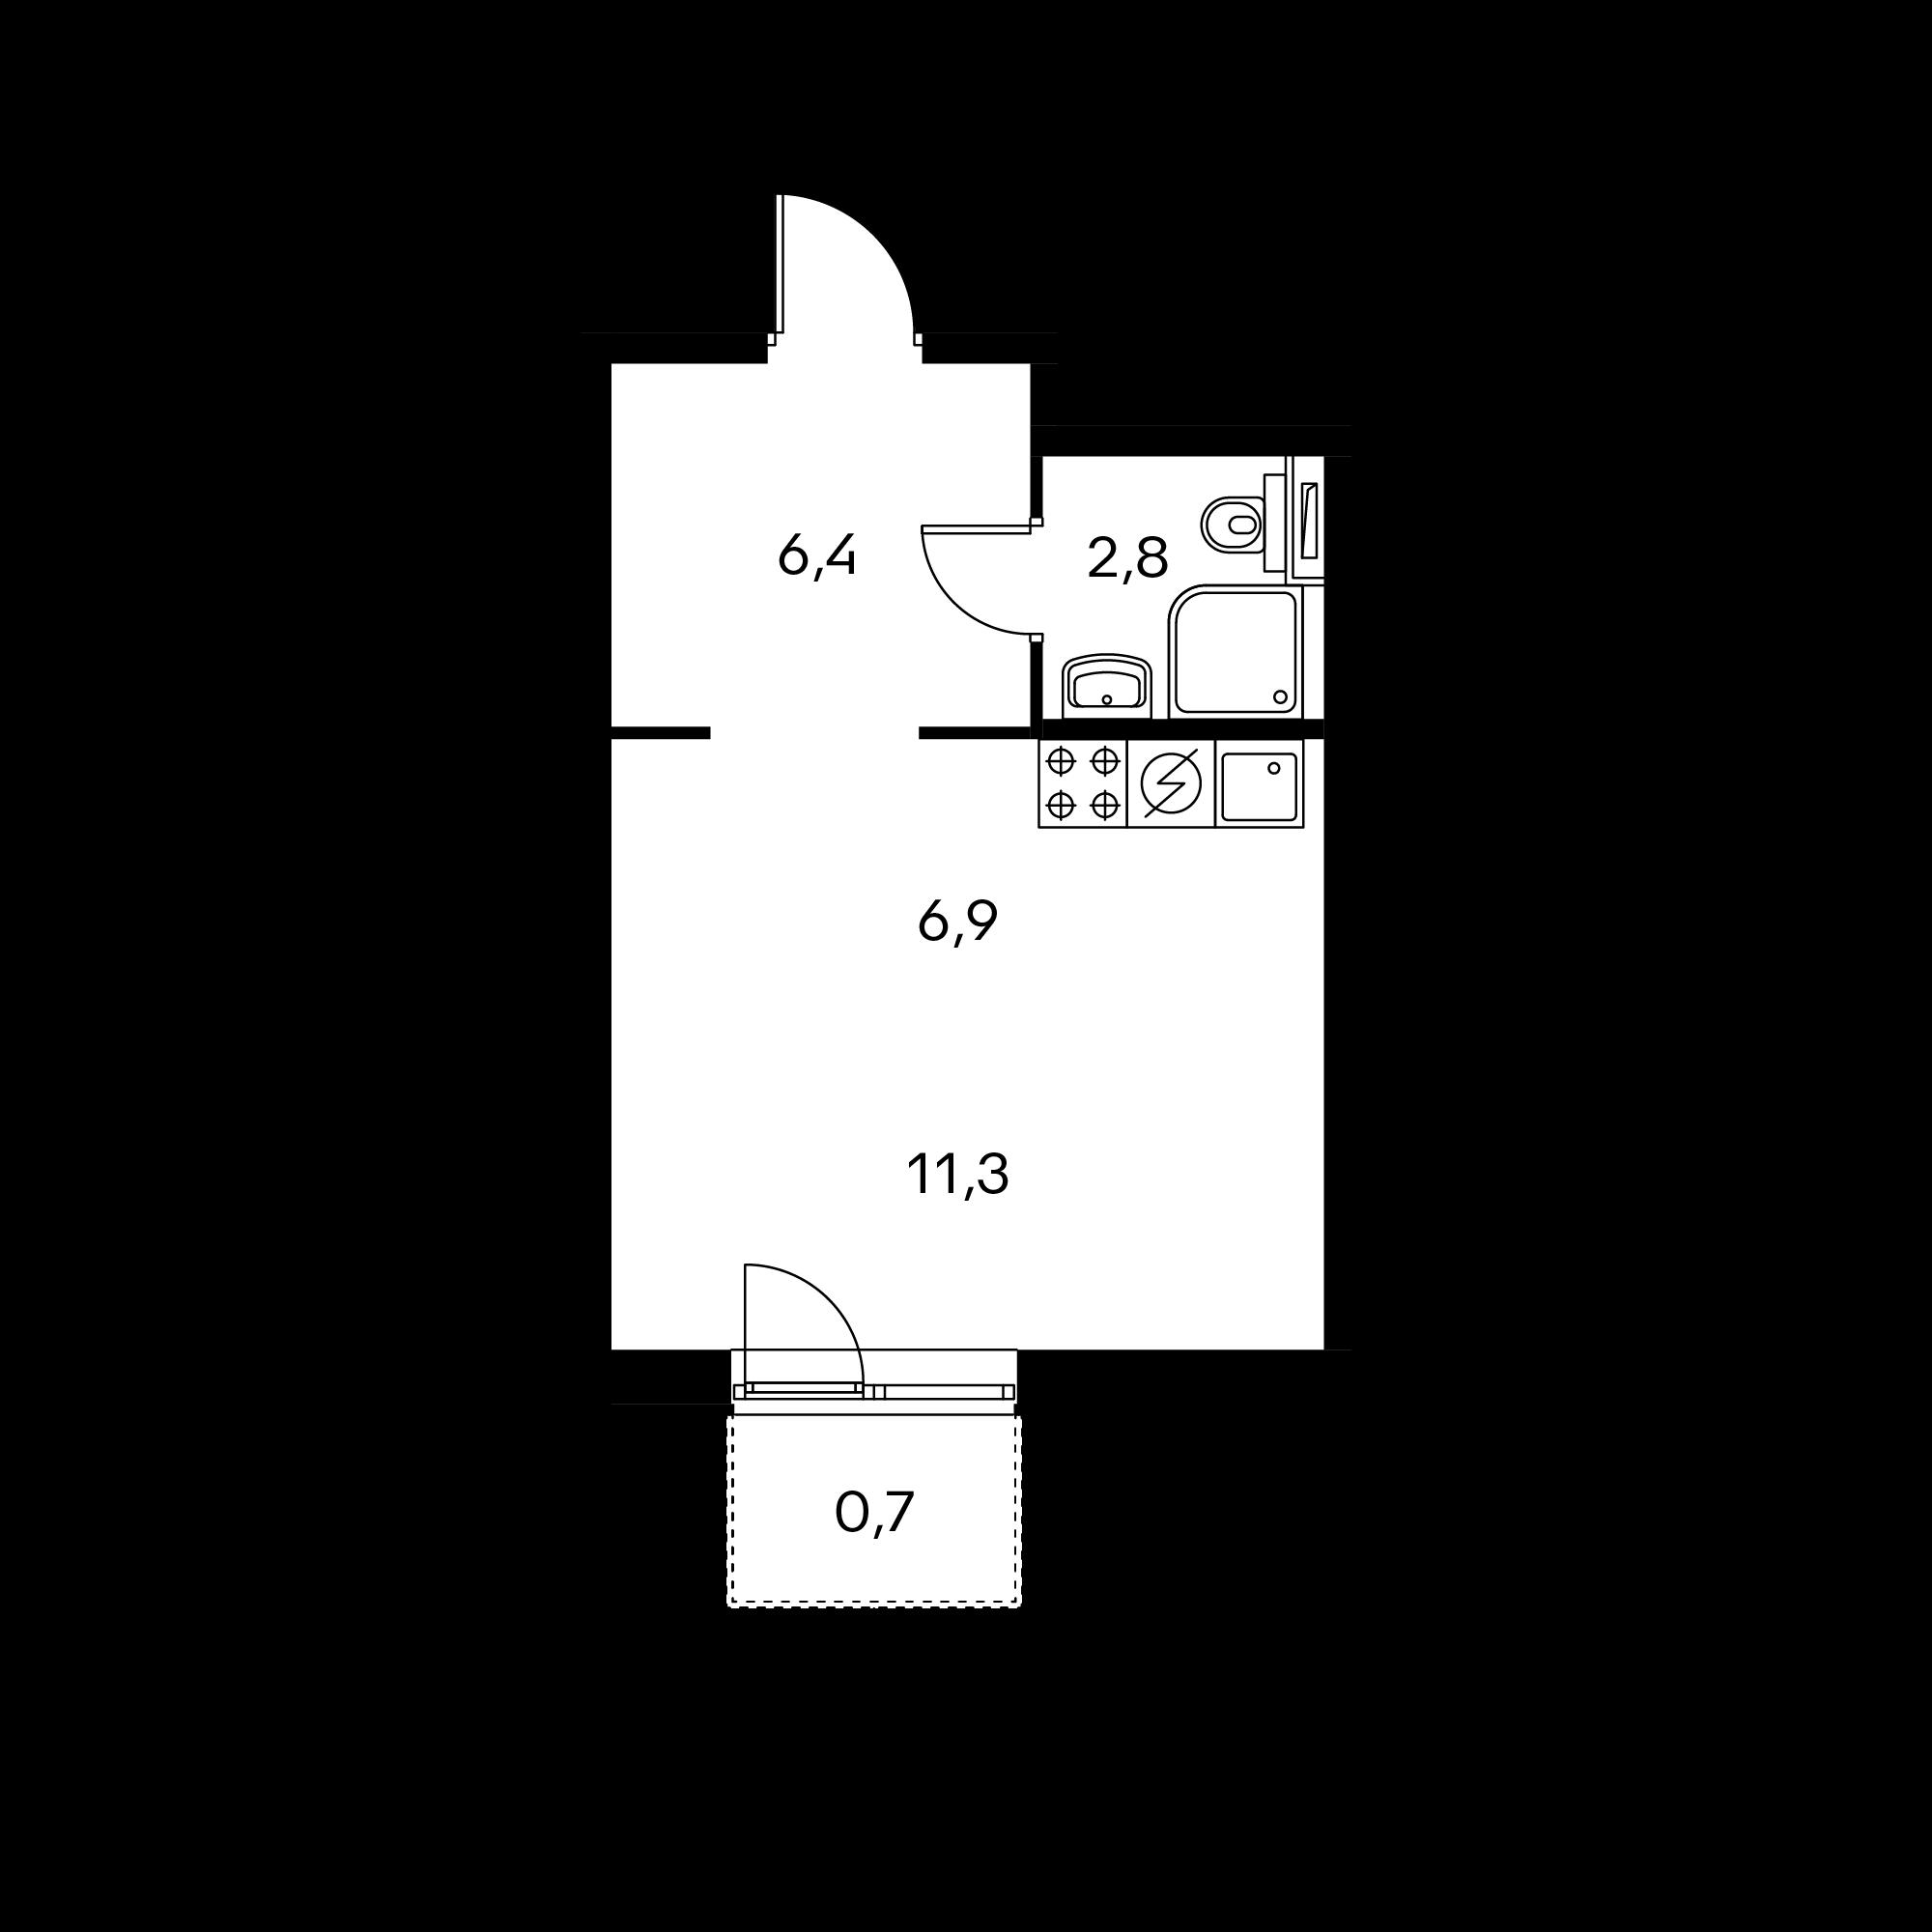 1NS1_4.2-2_B